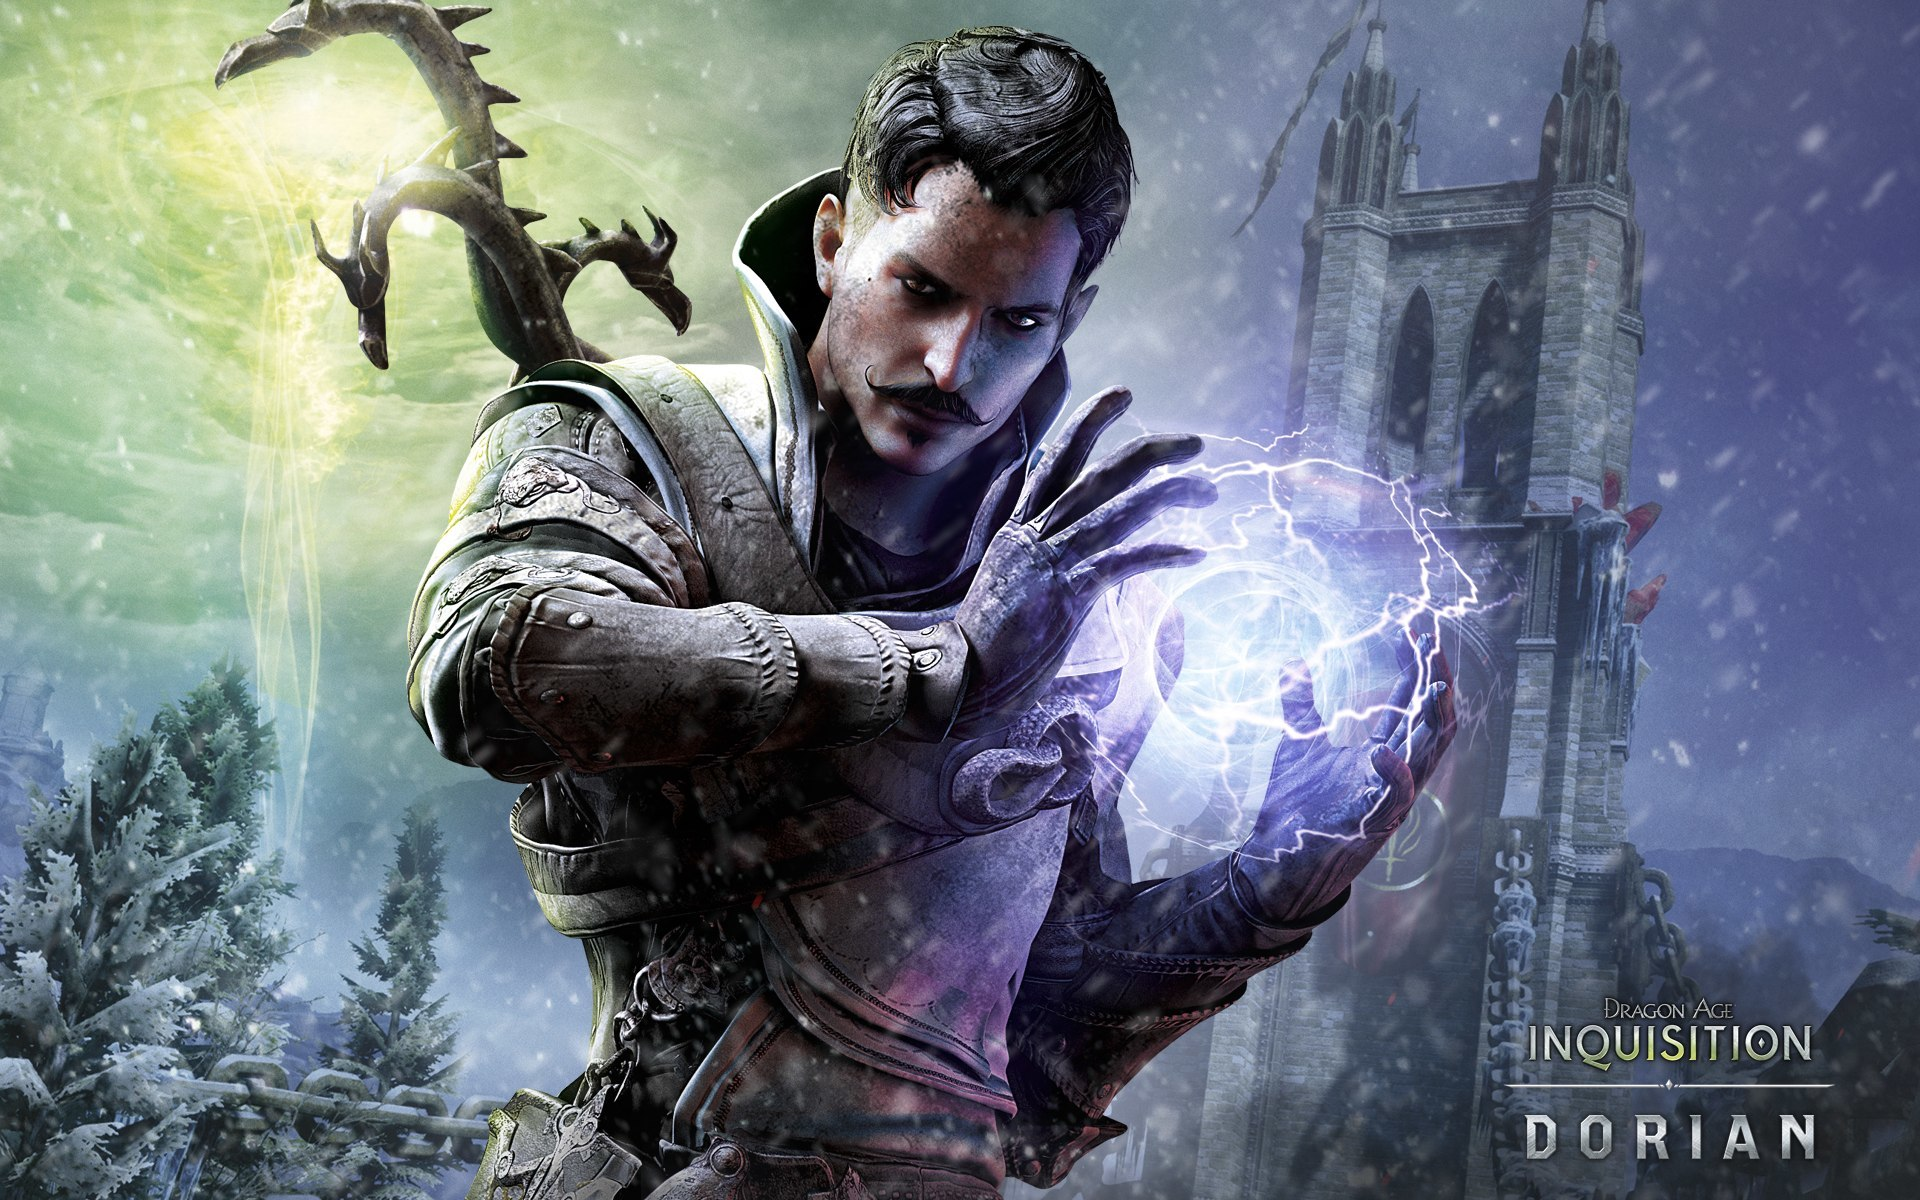 Dragon Age Inquisition Magician Wallpaper Hd Games 4k Wallpapers